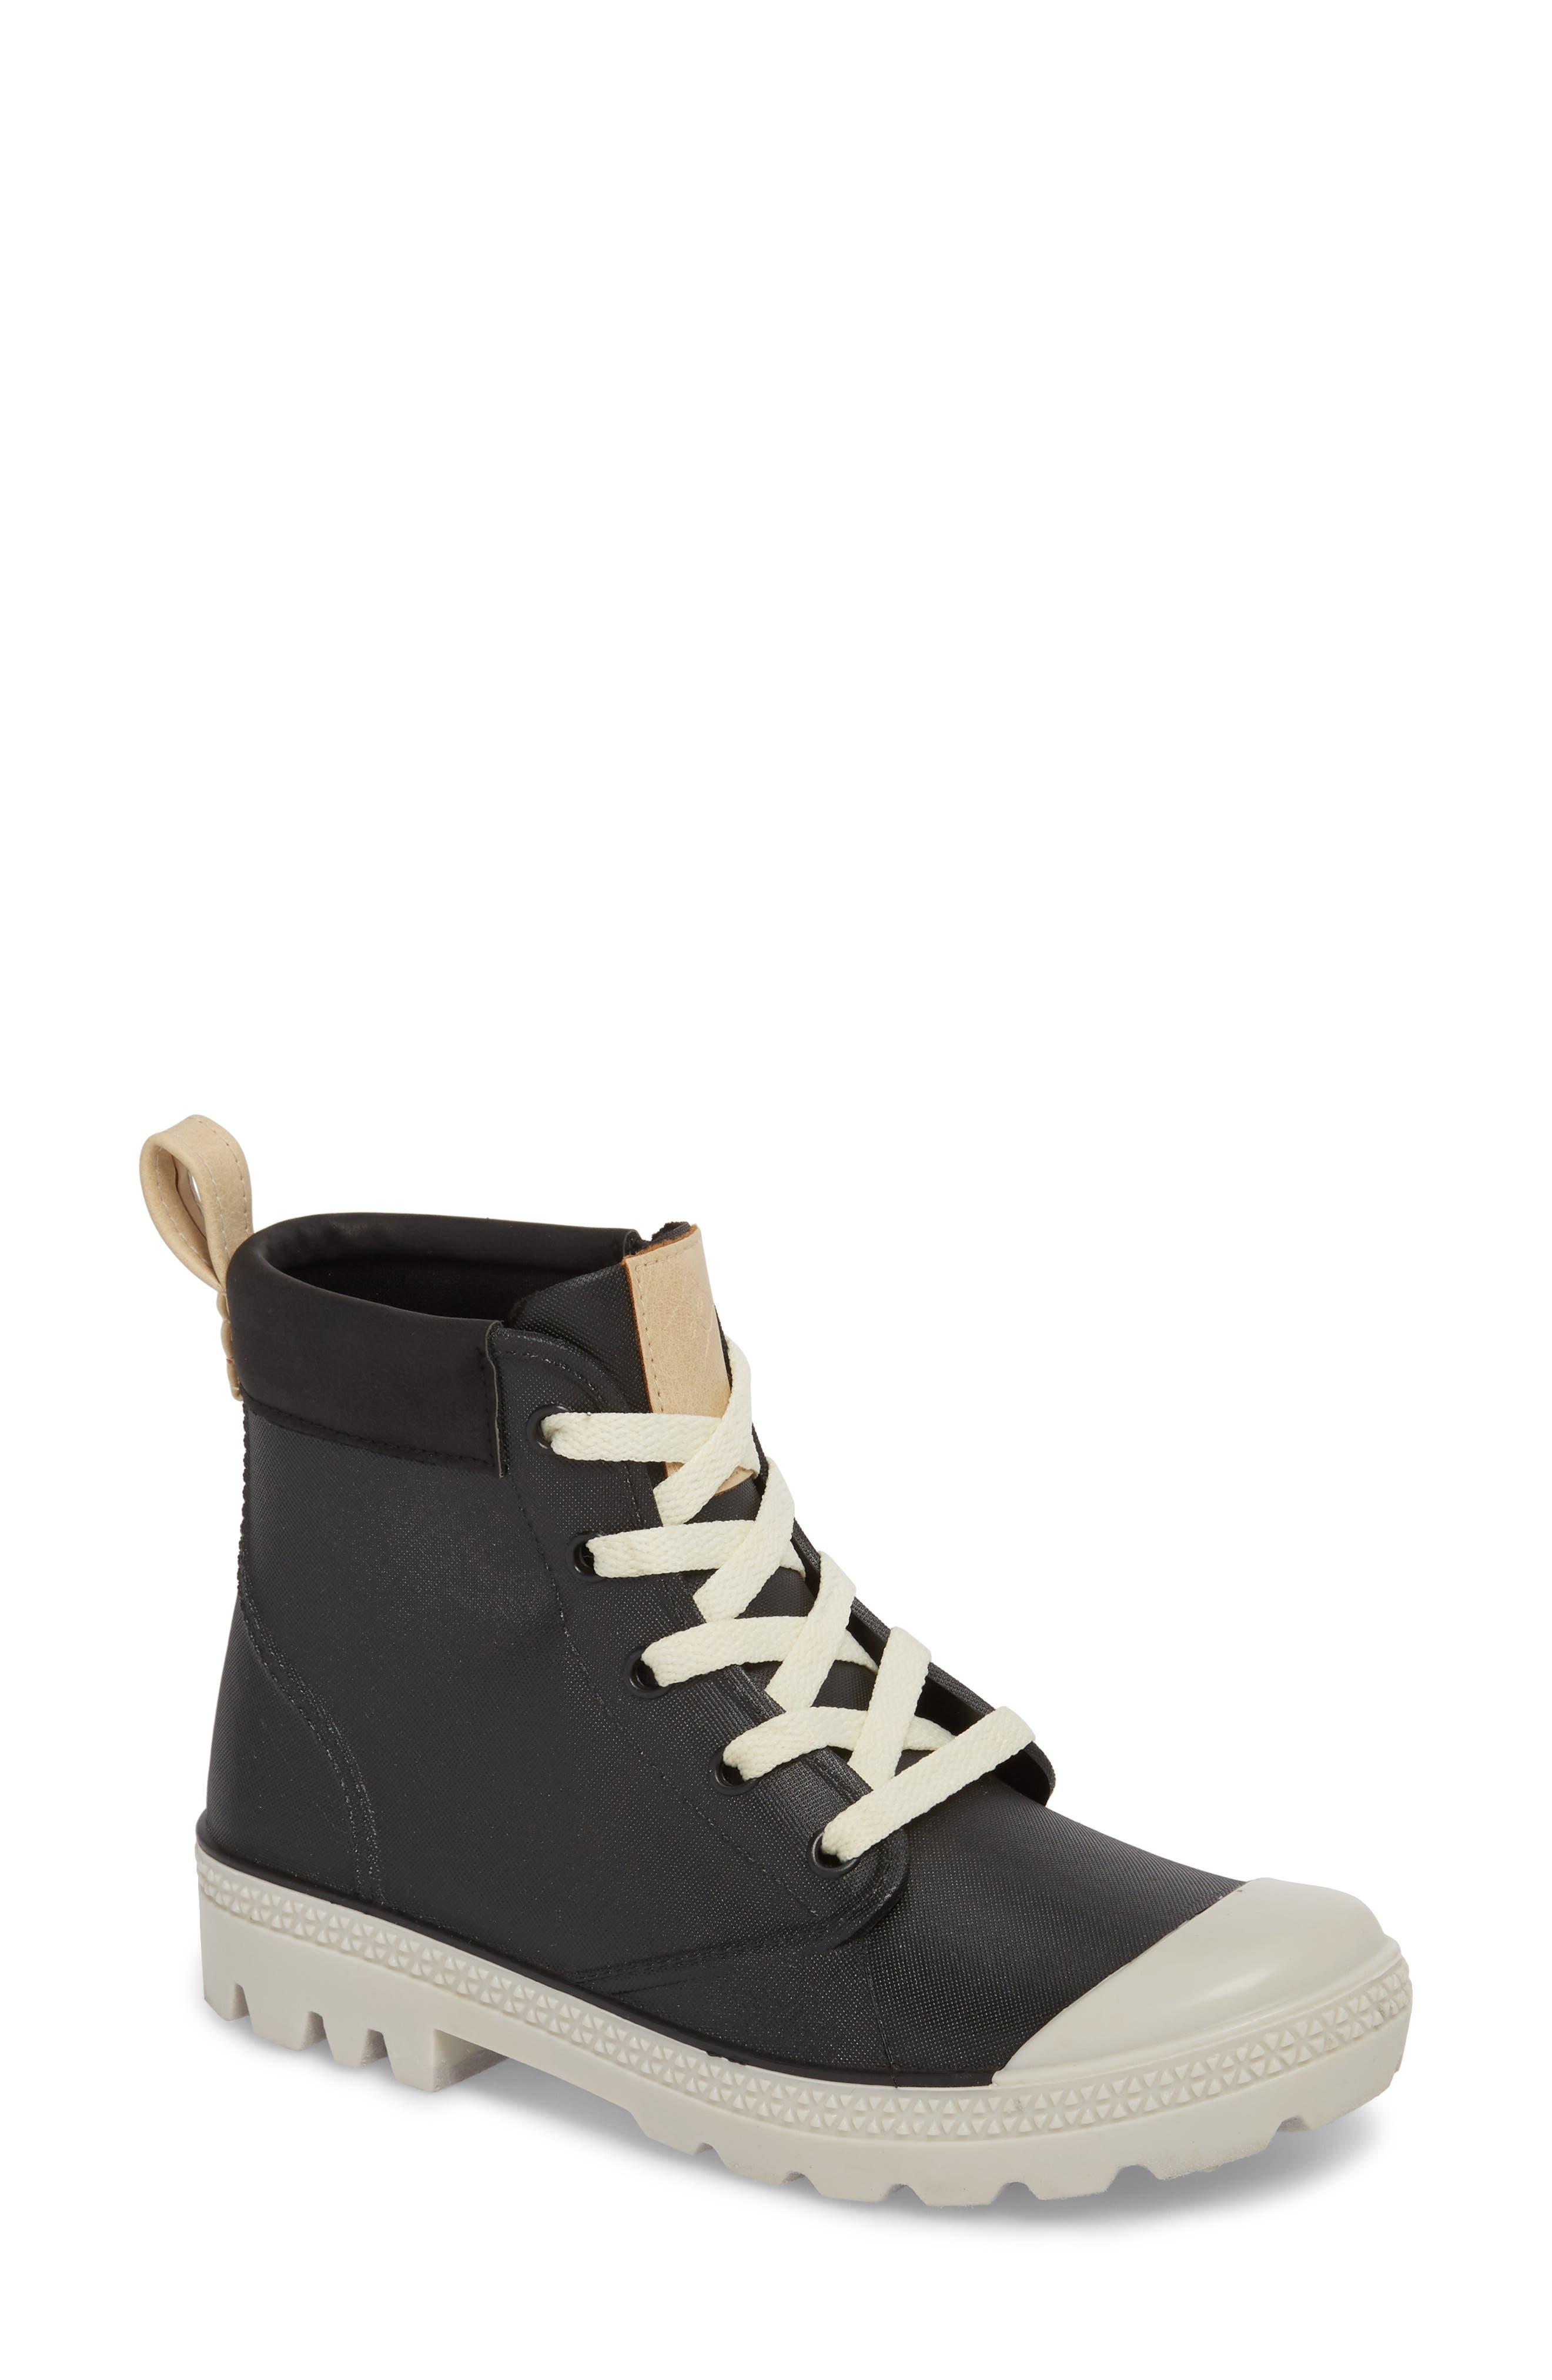 DÄV, Melrose Waterproof Sneaker Boot, Main thumbnail 1, color, 001